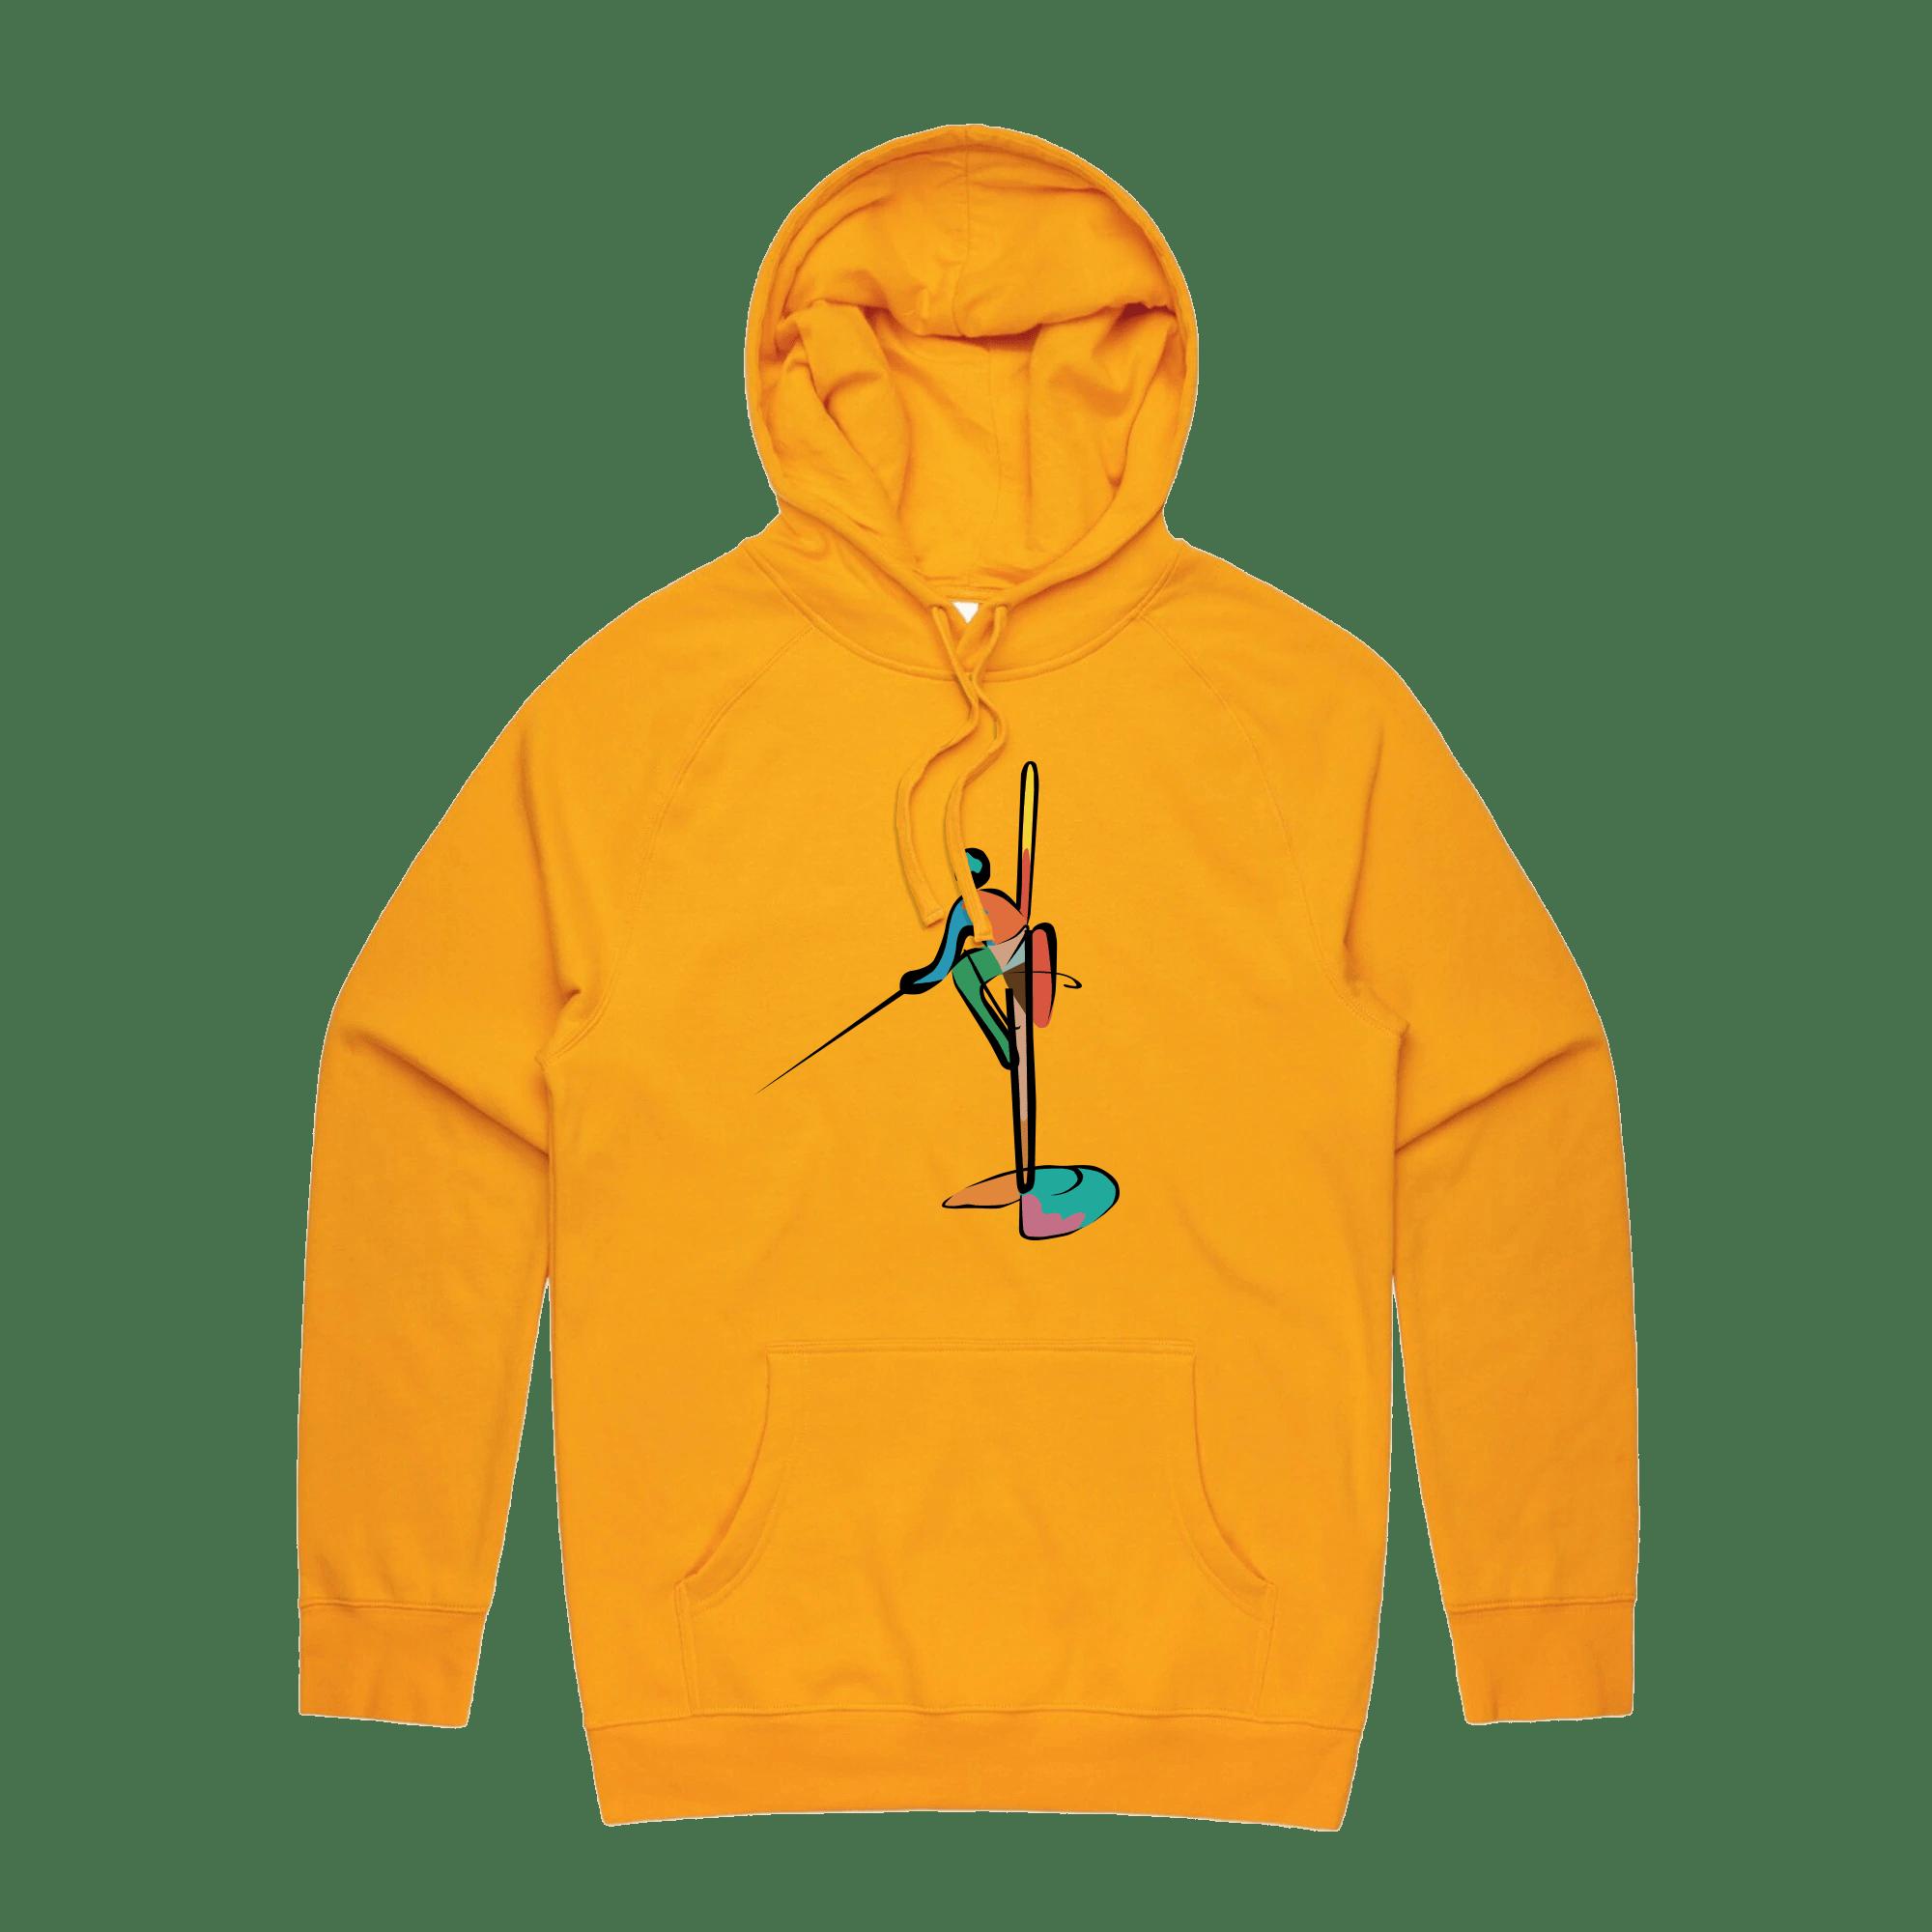 Colourful Fisherman Hoodie - GOLD